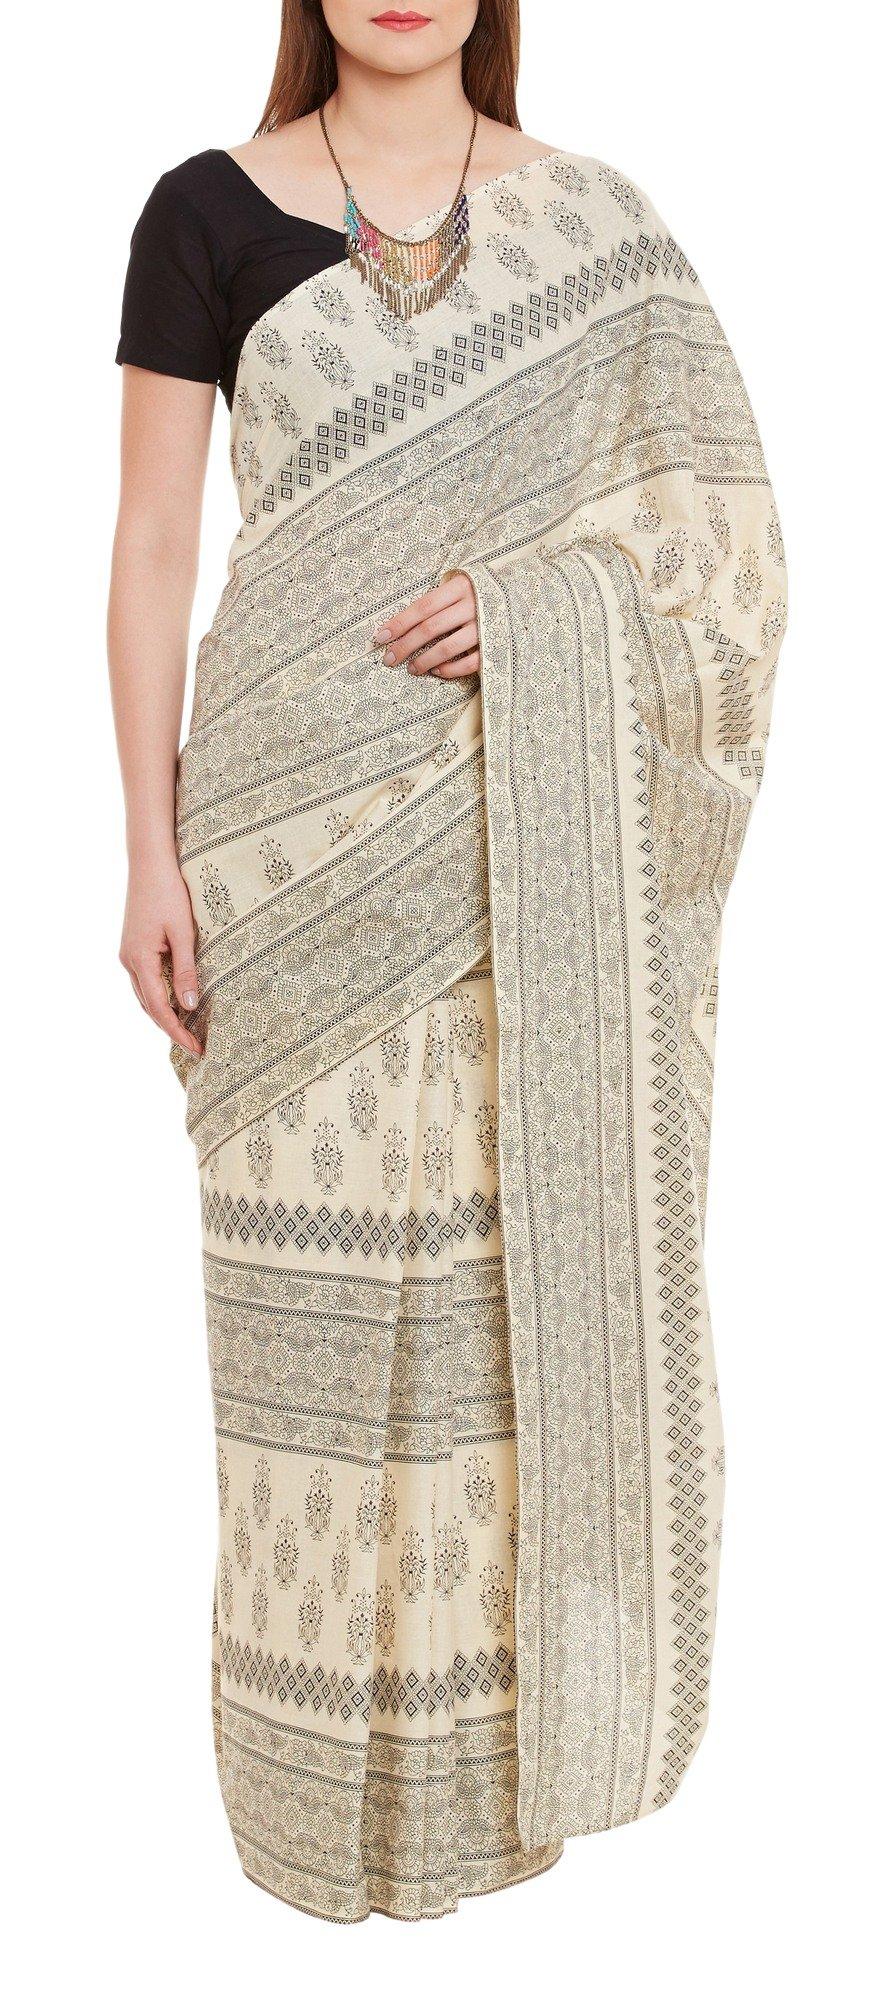 Women's Indian Warli Print Art Saree Cotton Set of 3 Sari Blouse Petticoat Skirt,W-CSR0332-5003